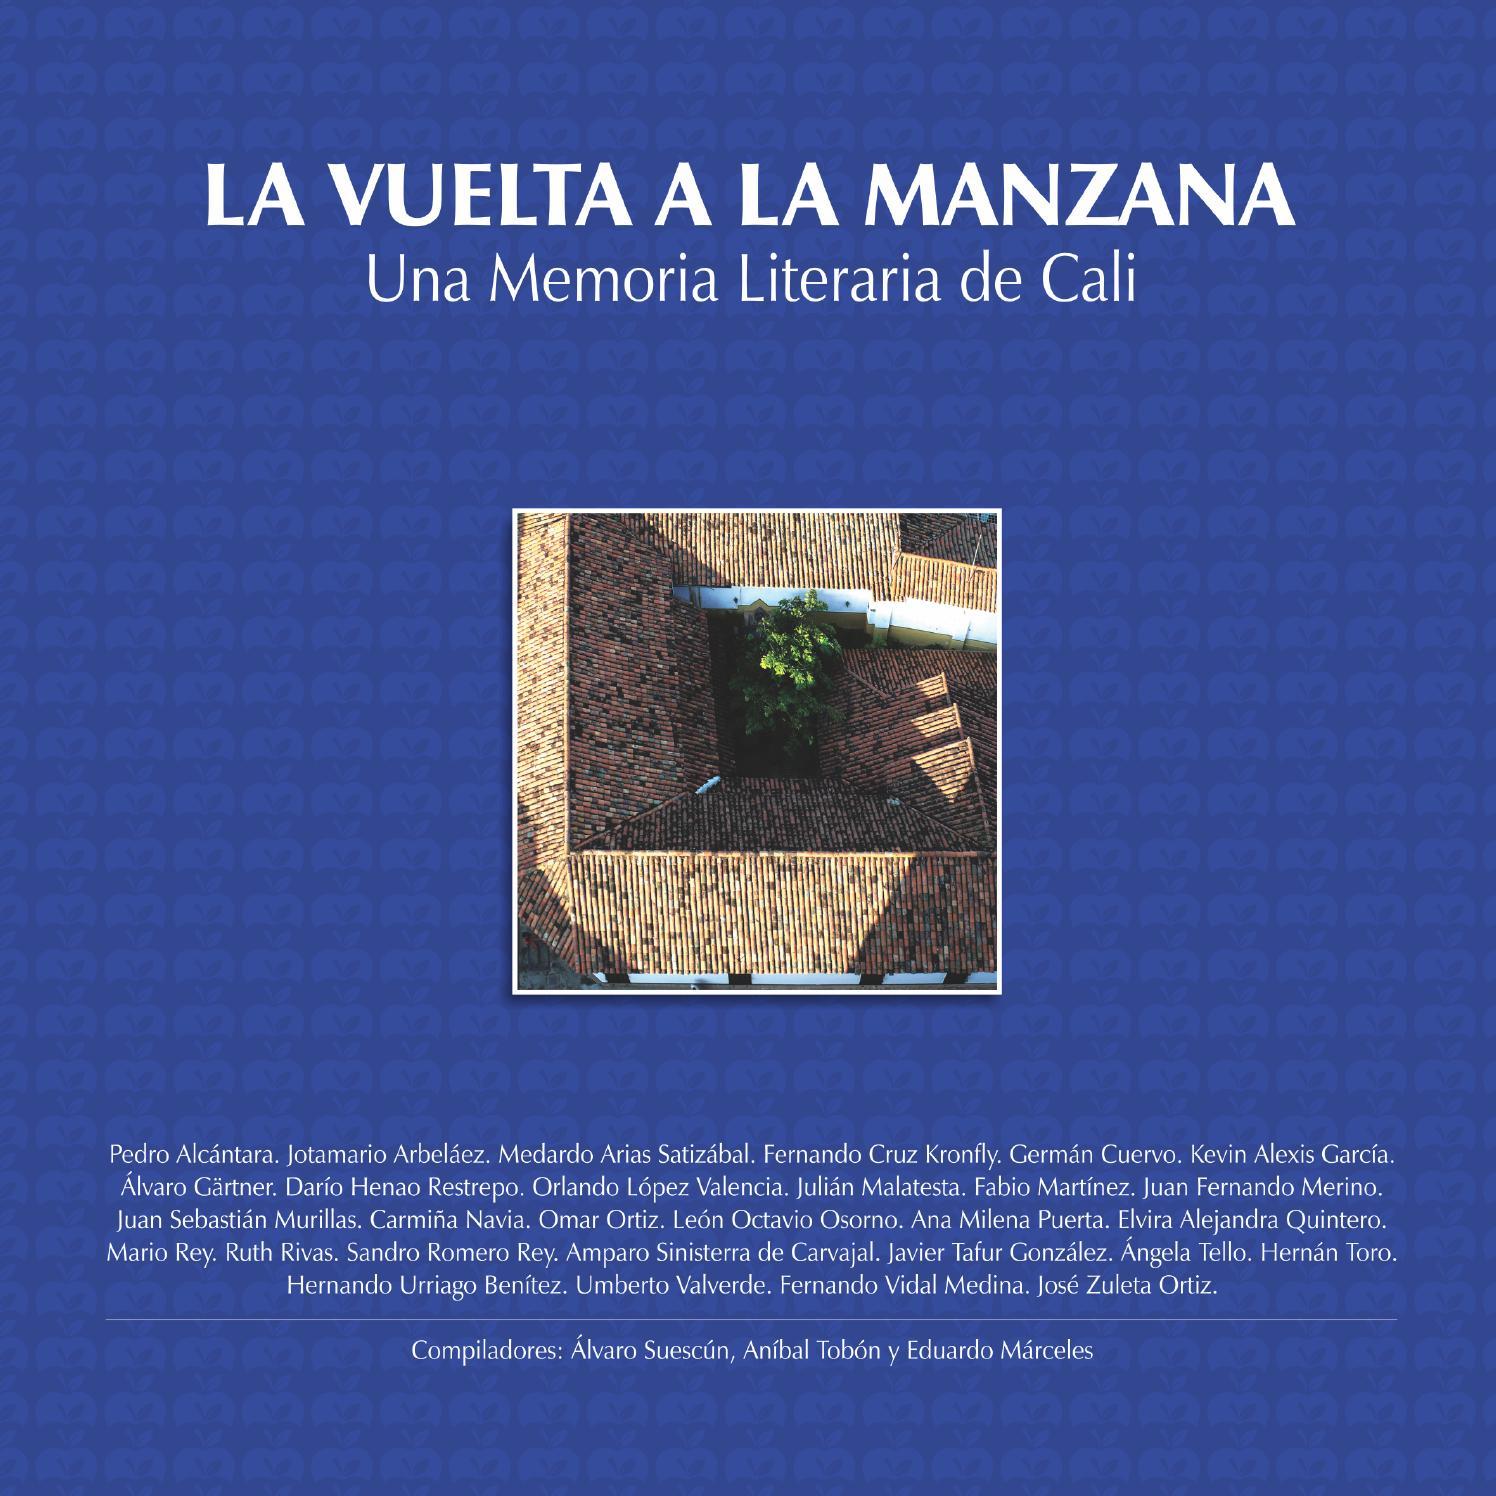 La vuelta a la manzana memoria literaria de cali (2) by Gabriel Ruiz ...